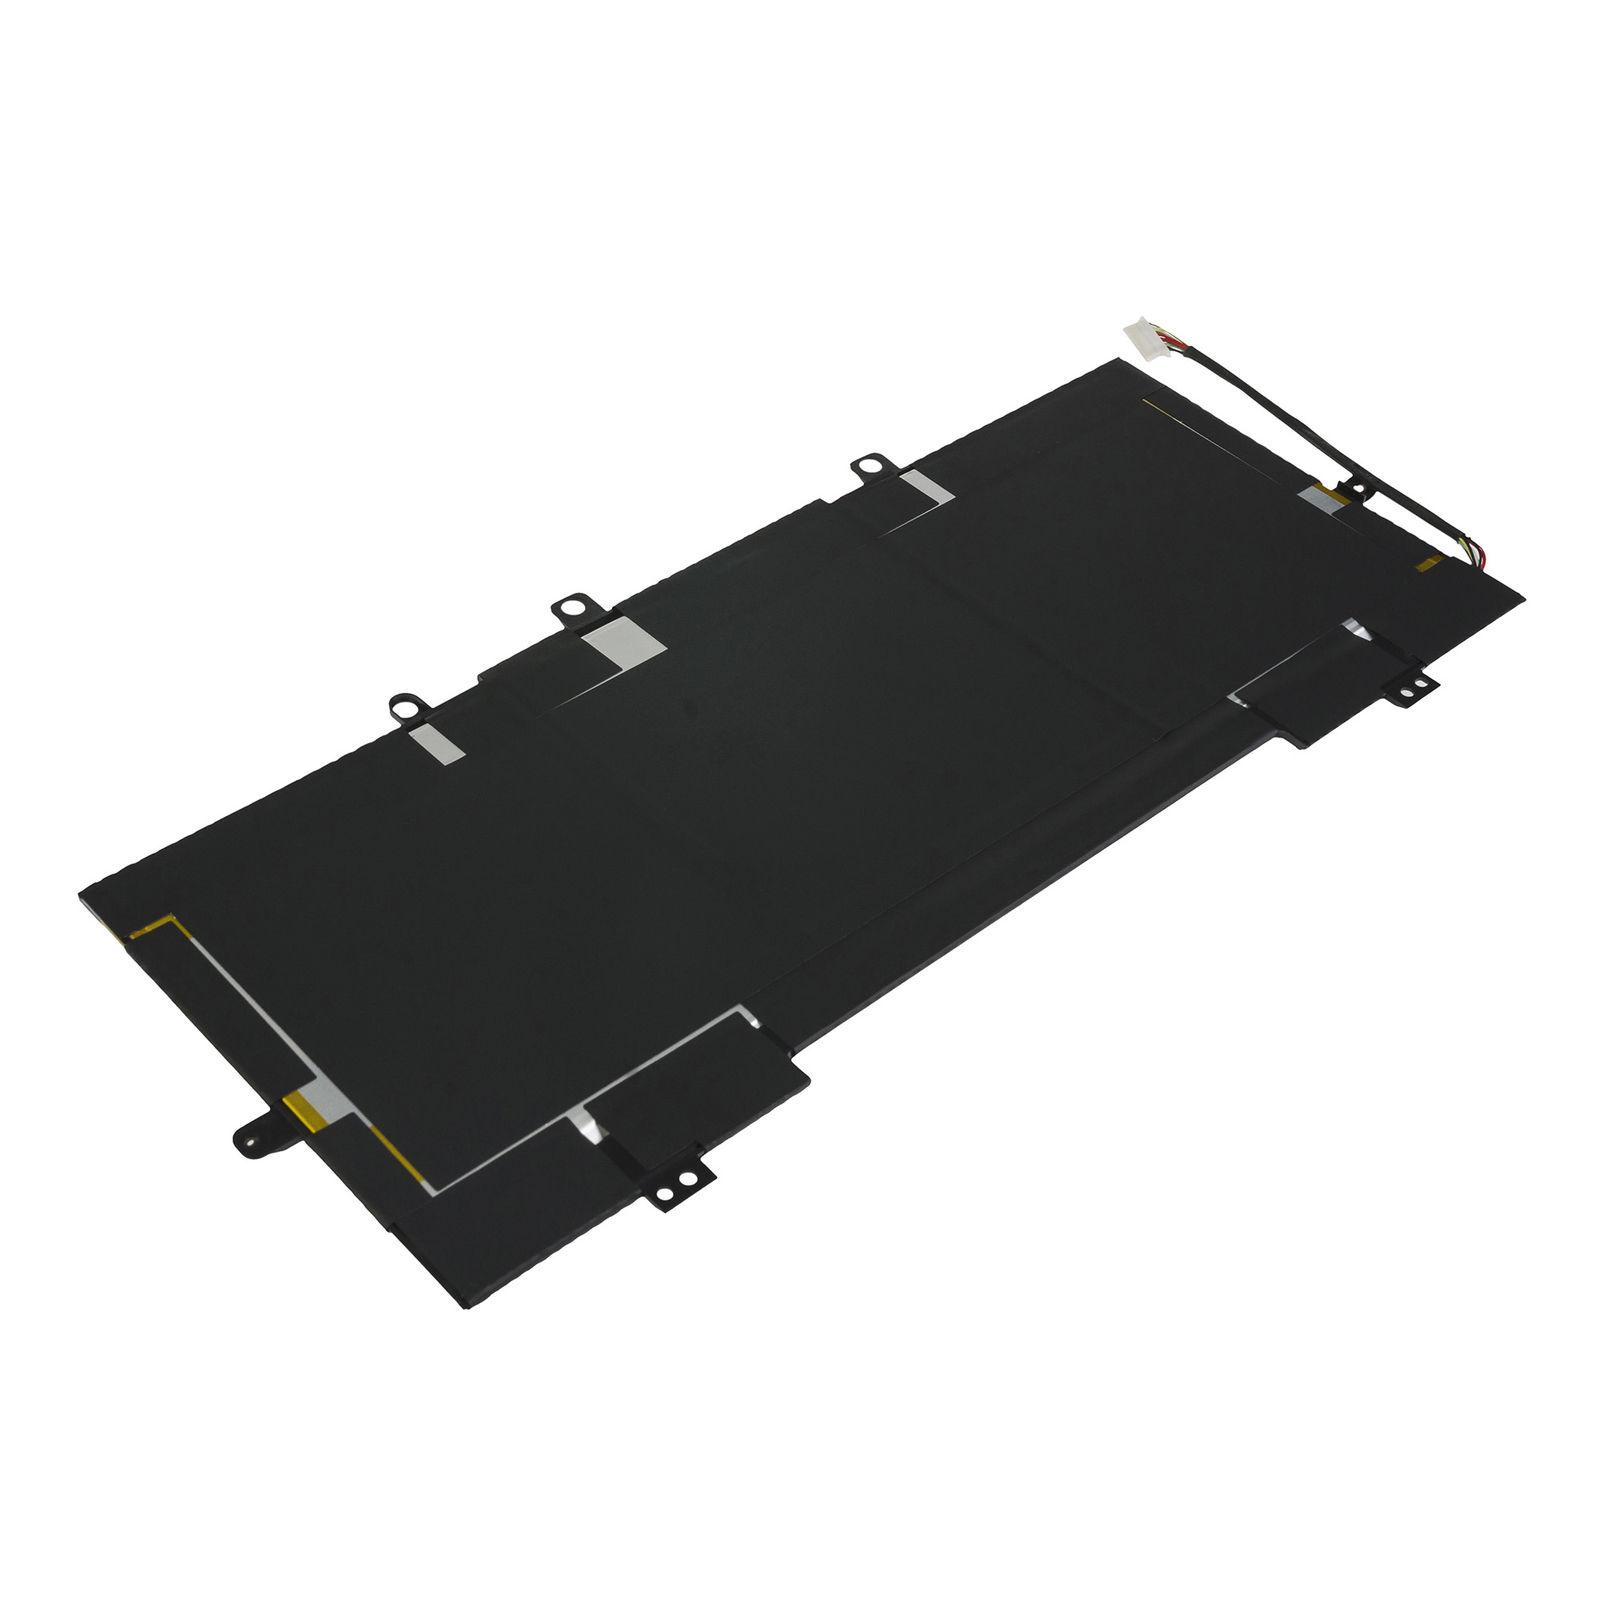 VR03 VR03045XL VR03045XL-PL VR03XL VRO3 VRO3XL kompatibelt batterier